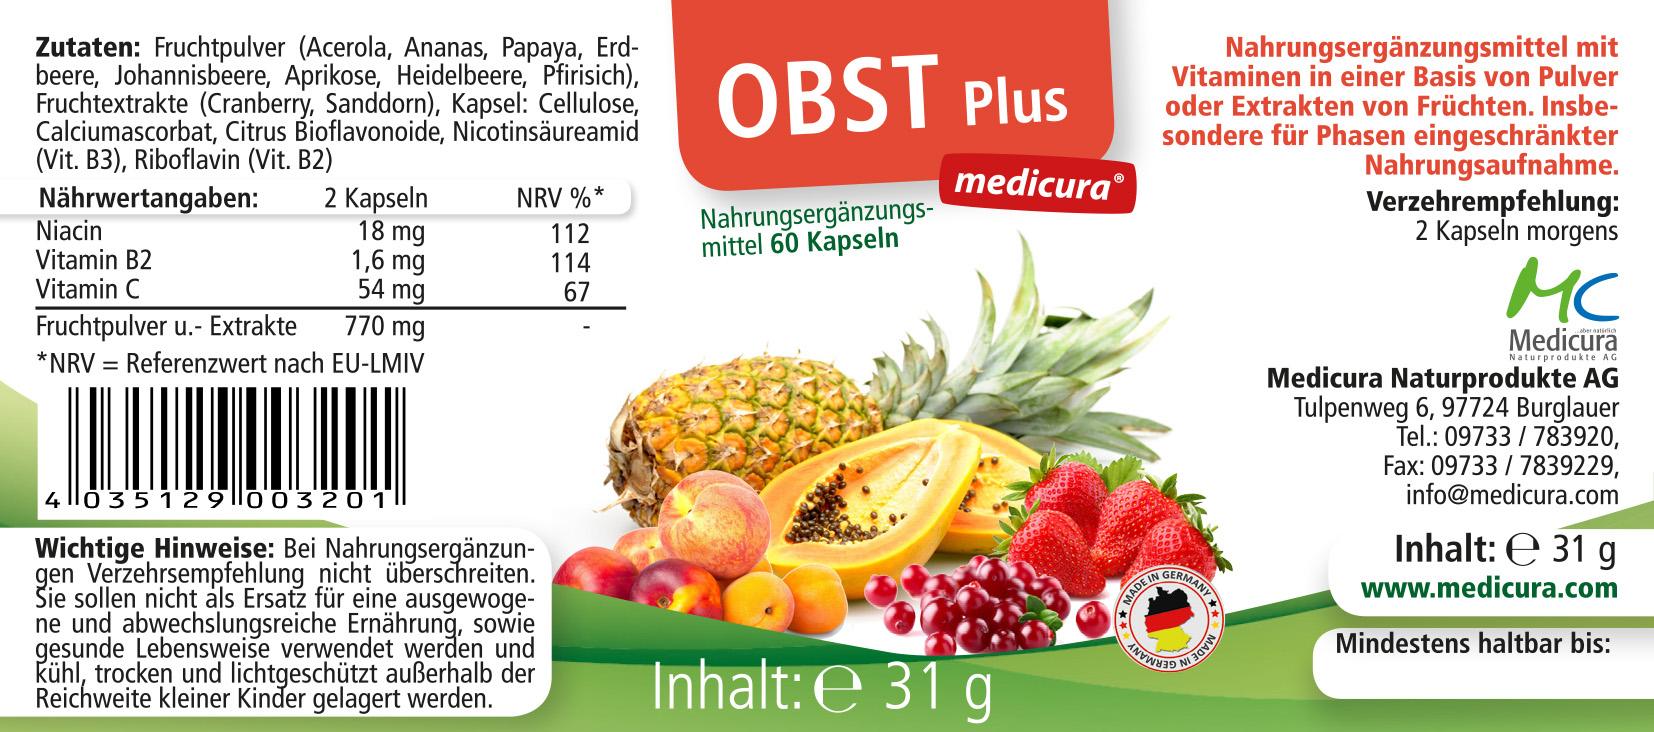 Obst Plus - 60 Kapseln